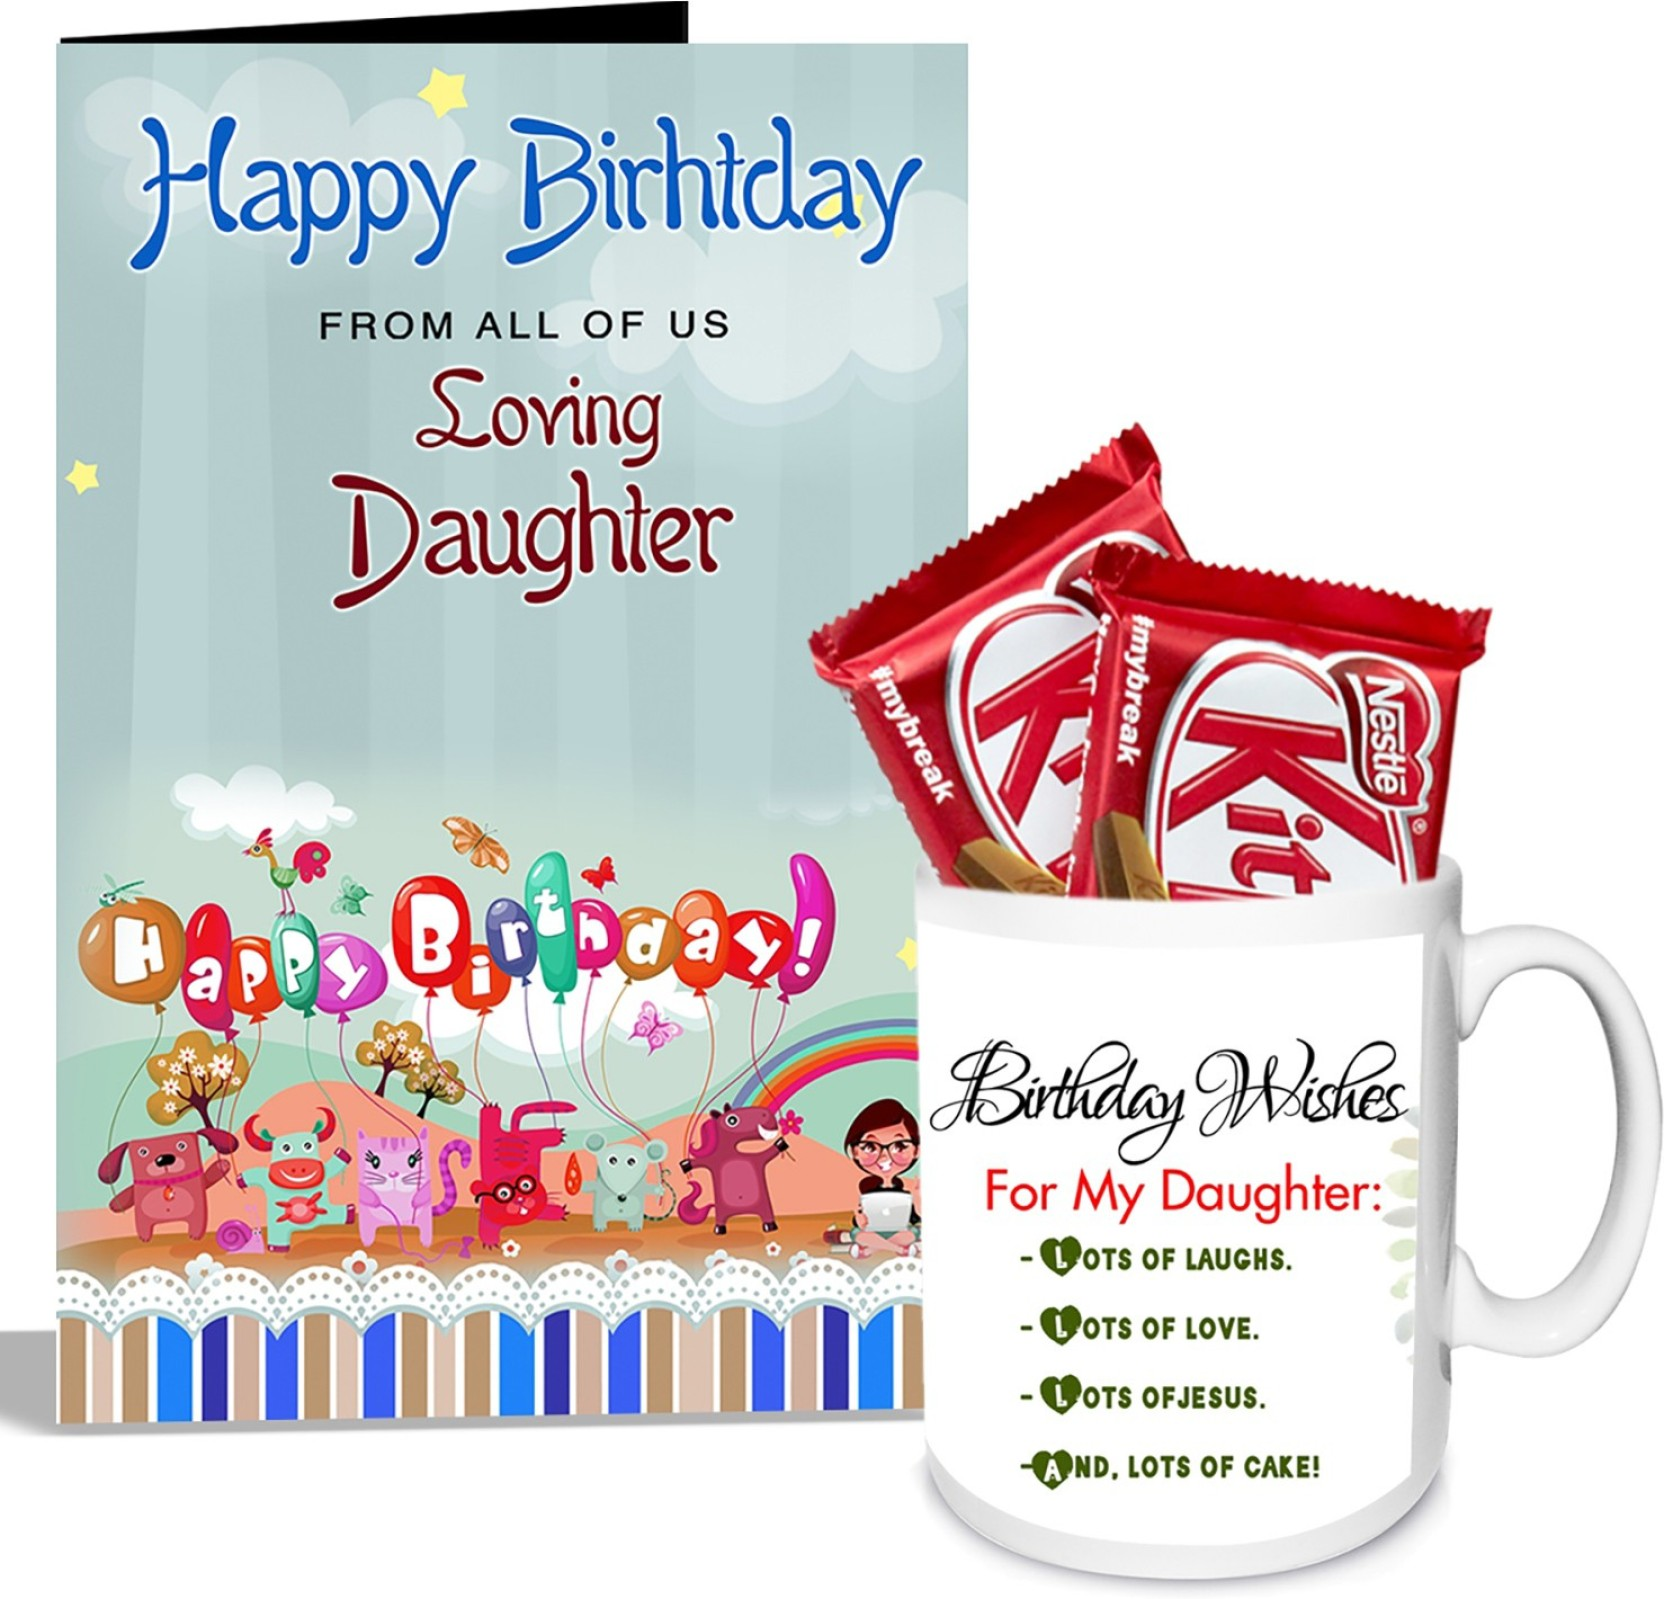 Alwaysgift Birthday Wishes For My Daughter Mug With Card Hamper Mug